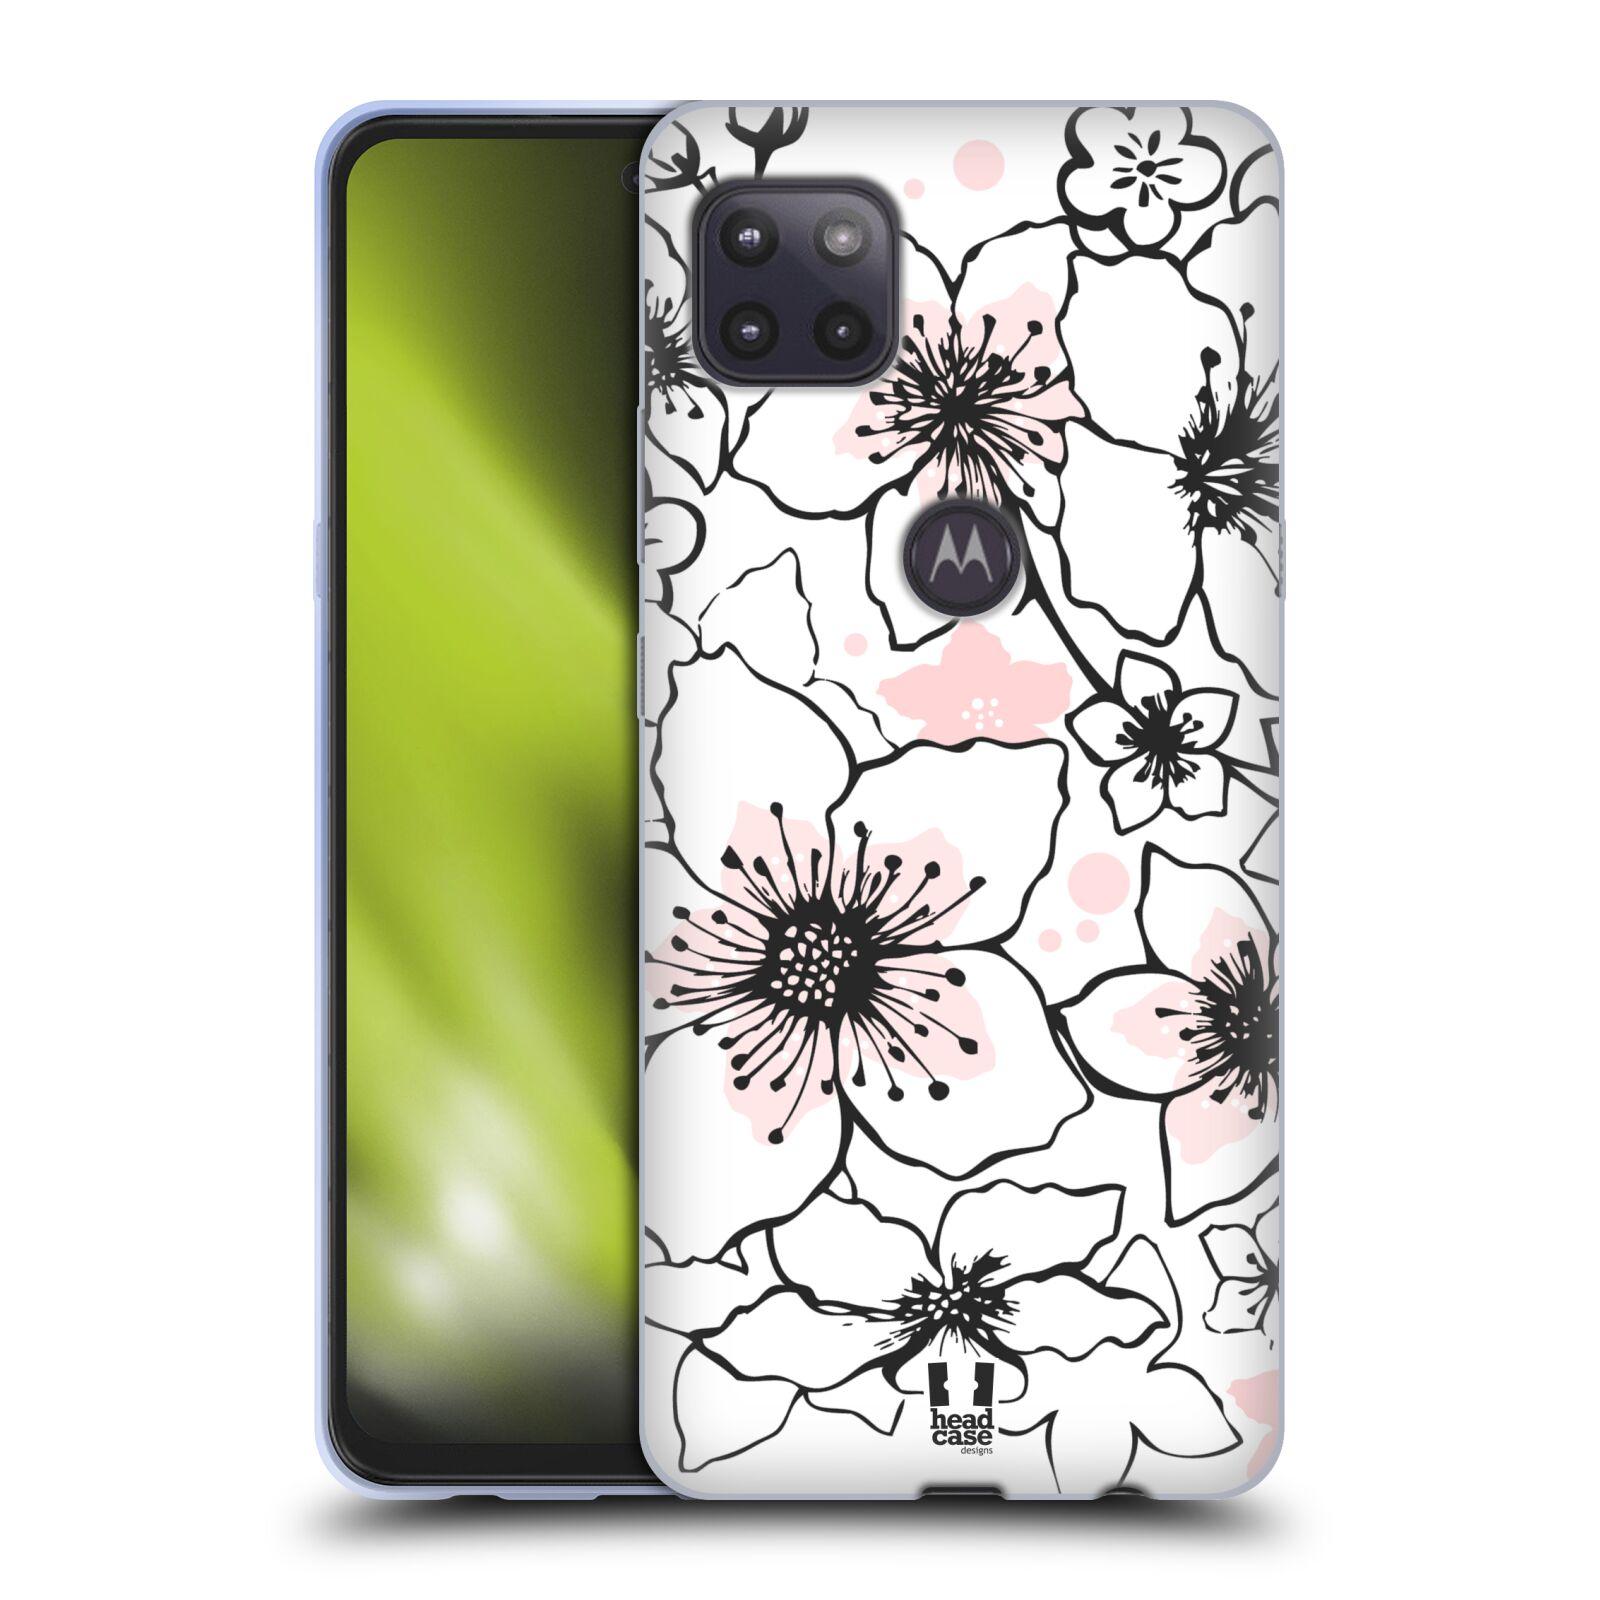 Silikonové pouzdro na mobil Motorola Moto G 5G - Head Case - BLOSSOMS SPRINGTIME